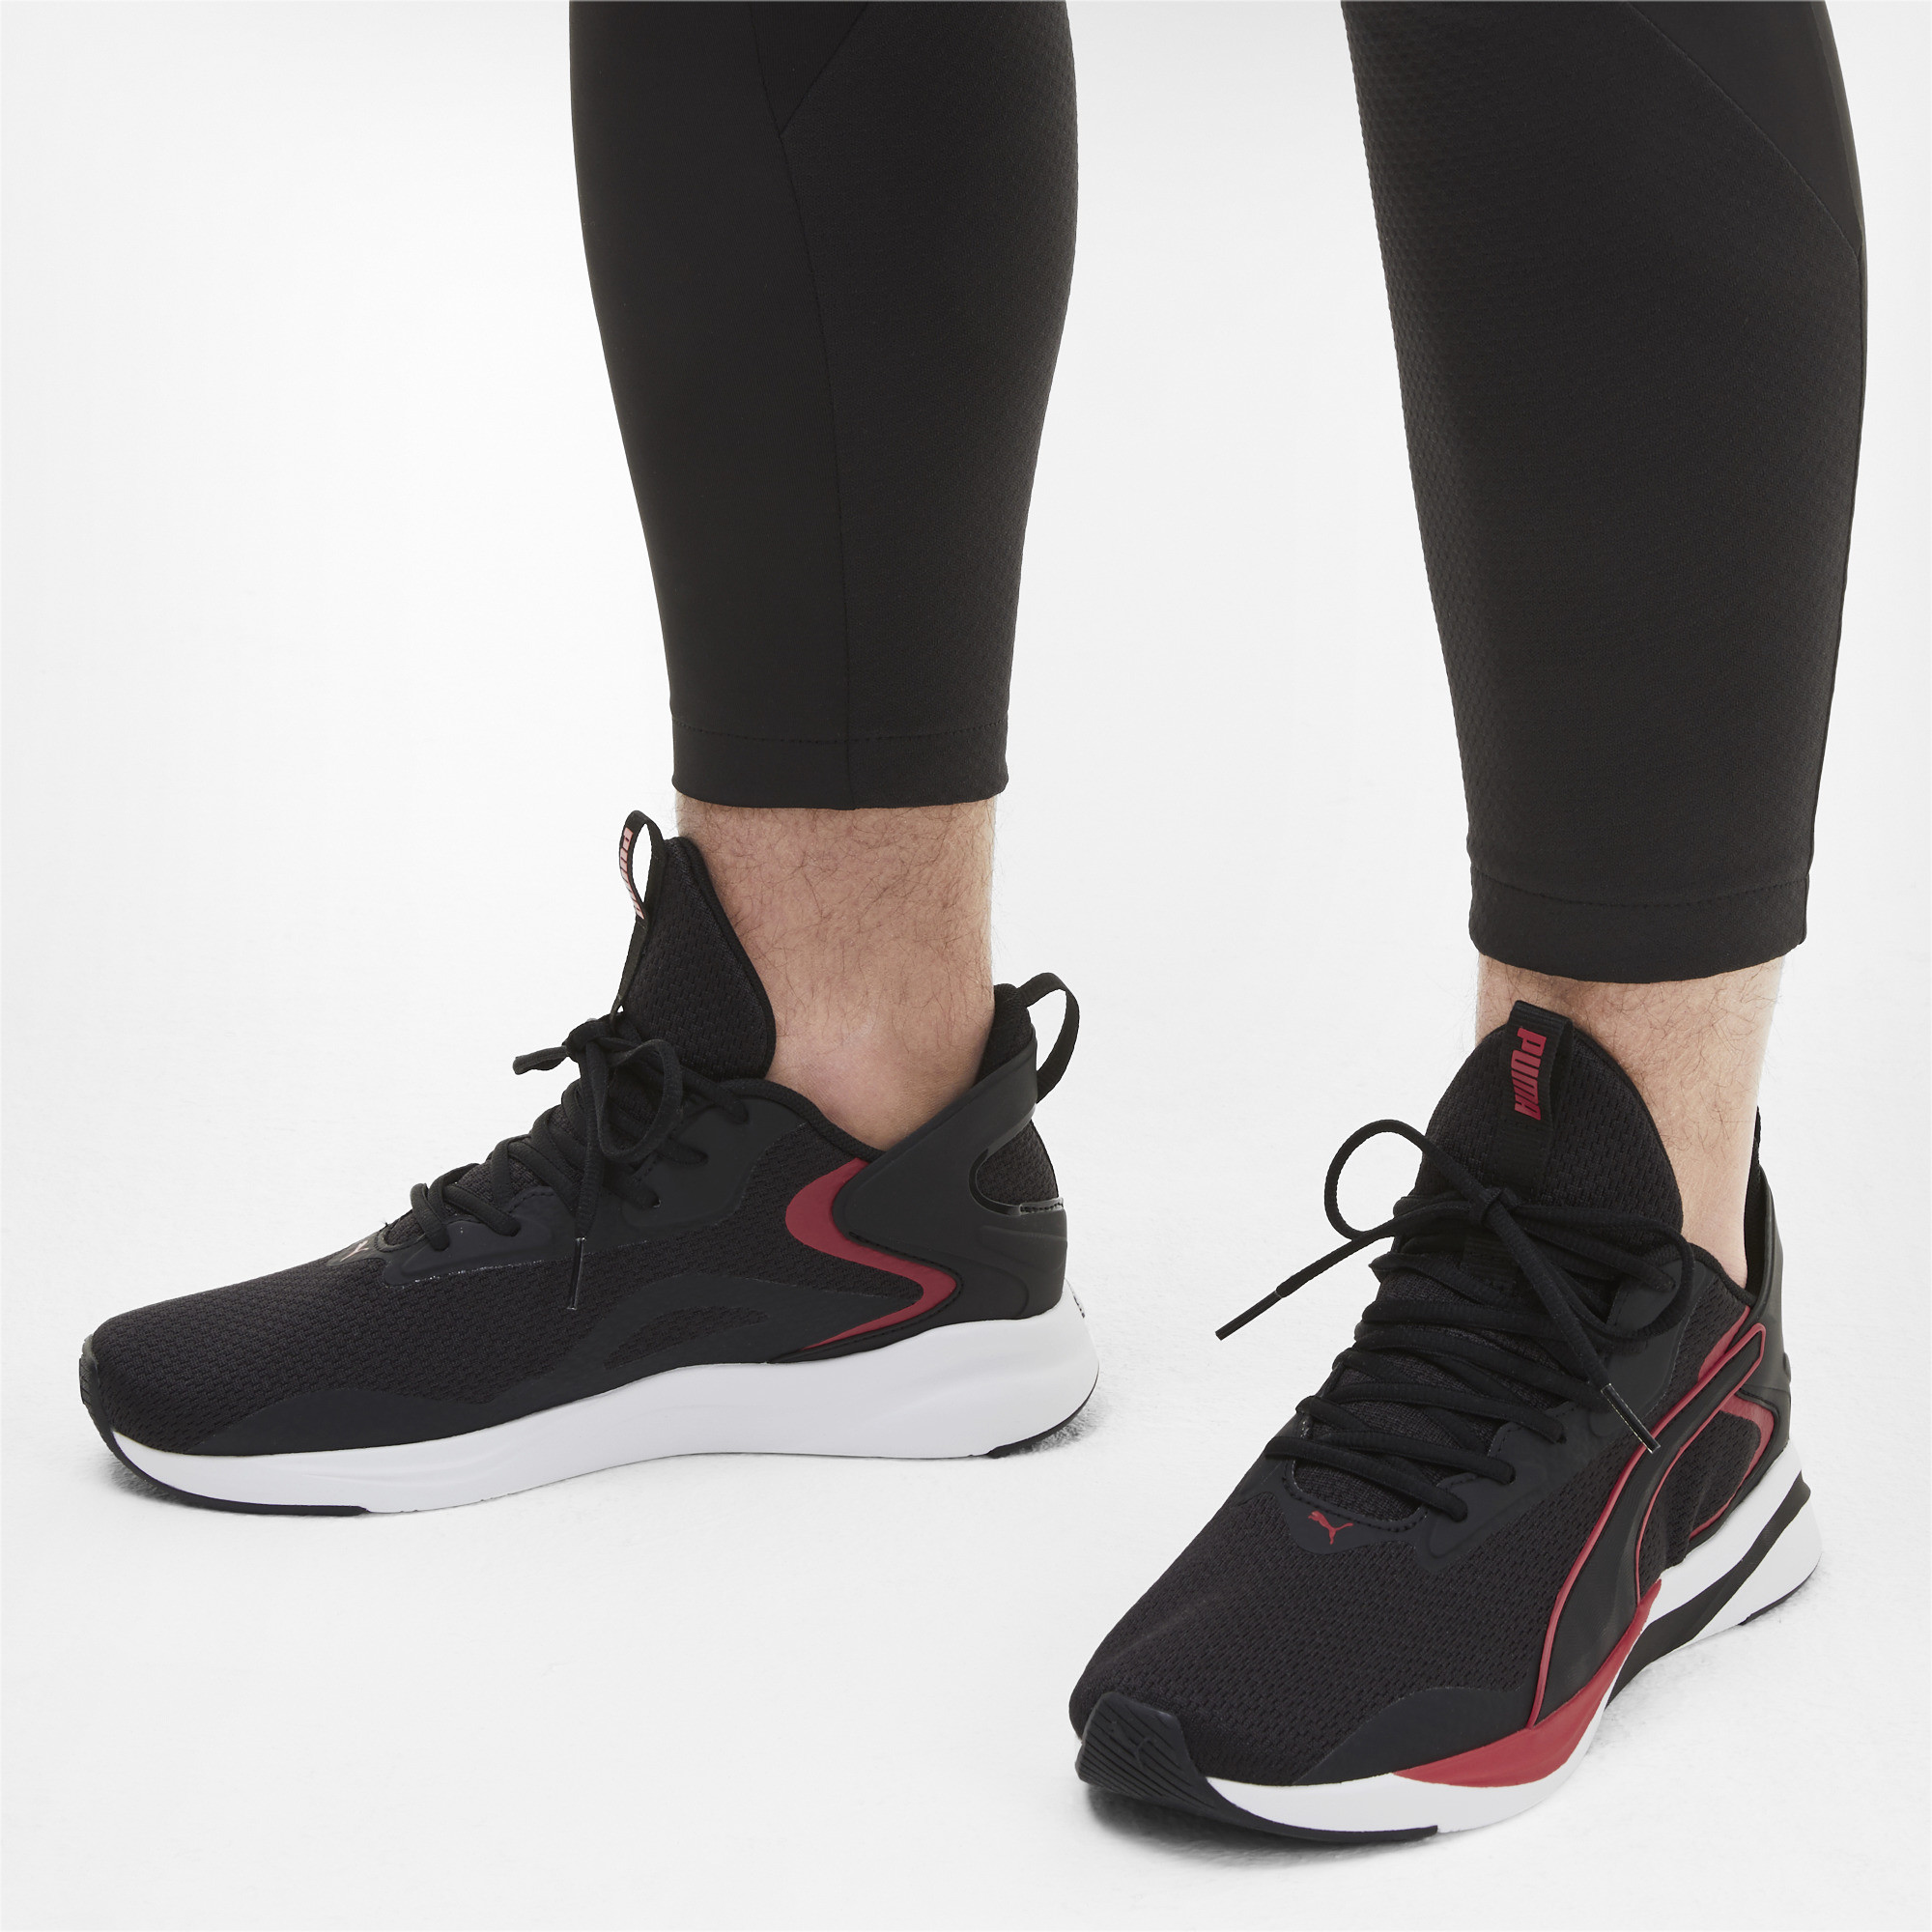 PUMA Men's SoftRide Rift Tech Running Shoes | eBay